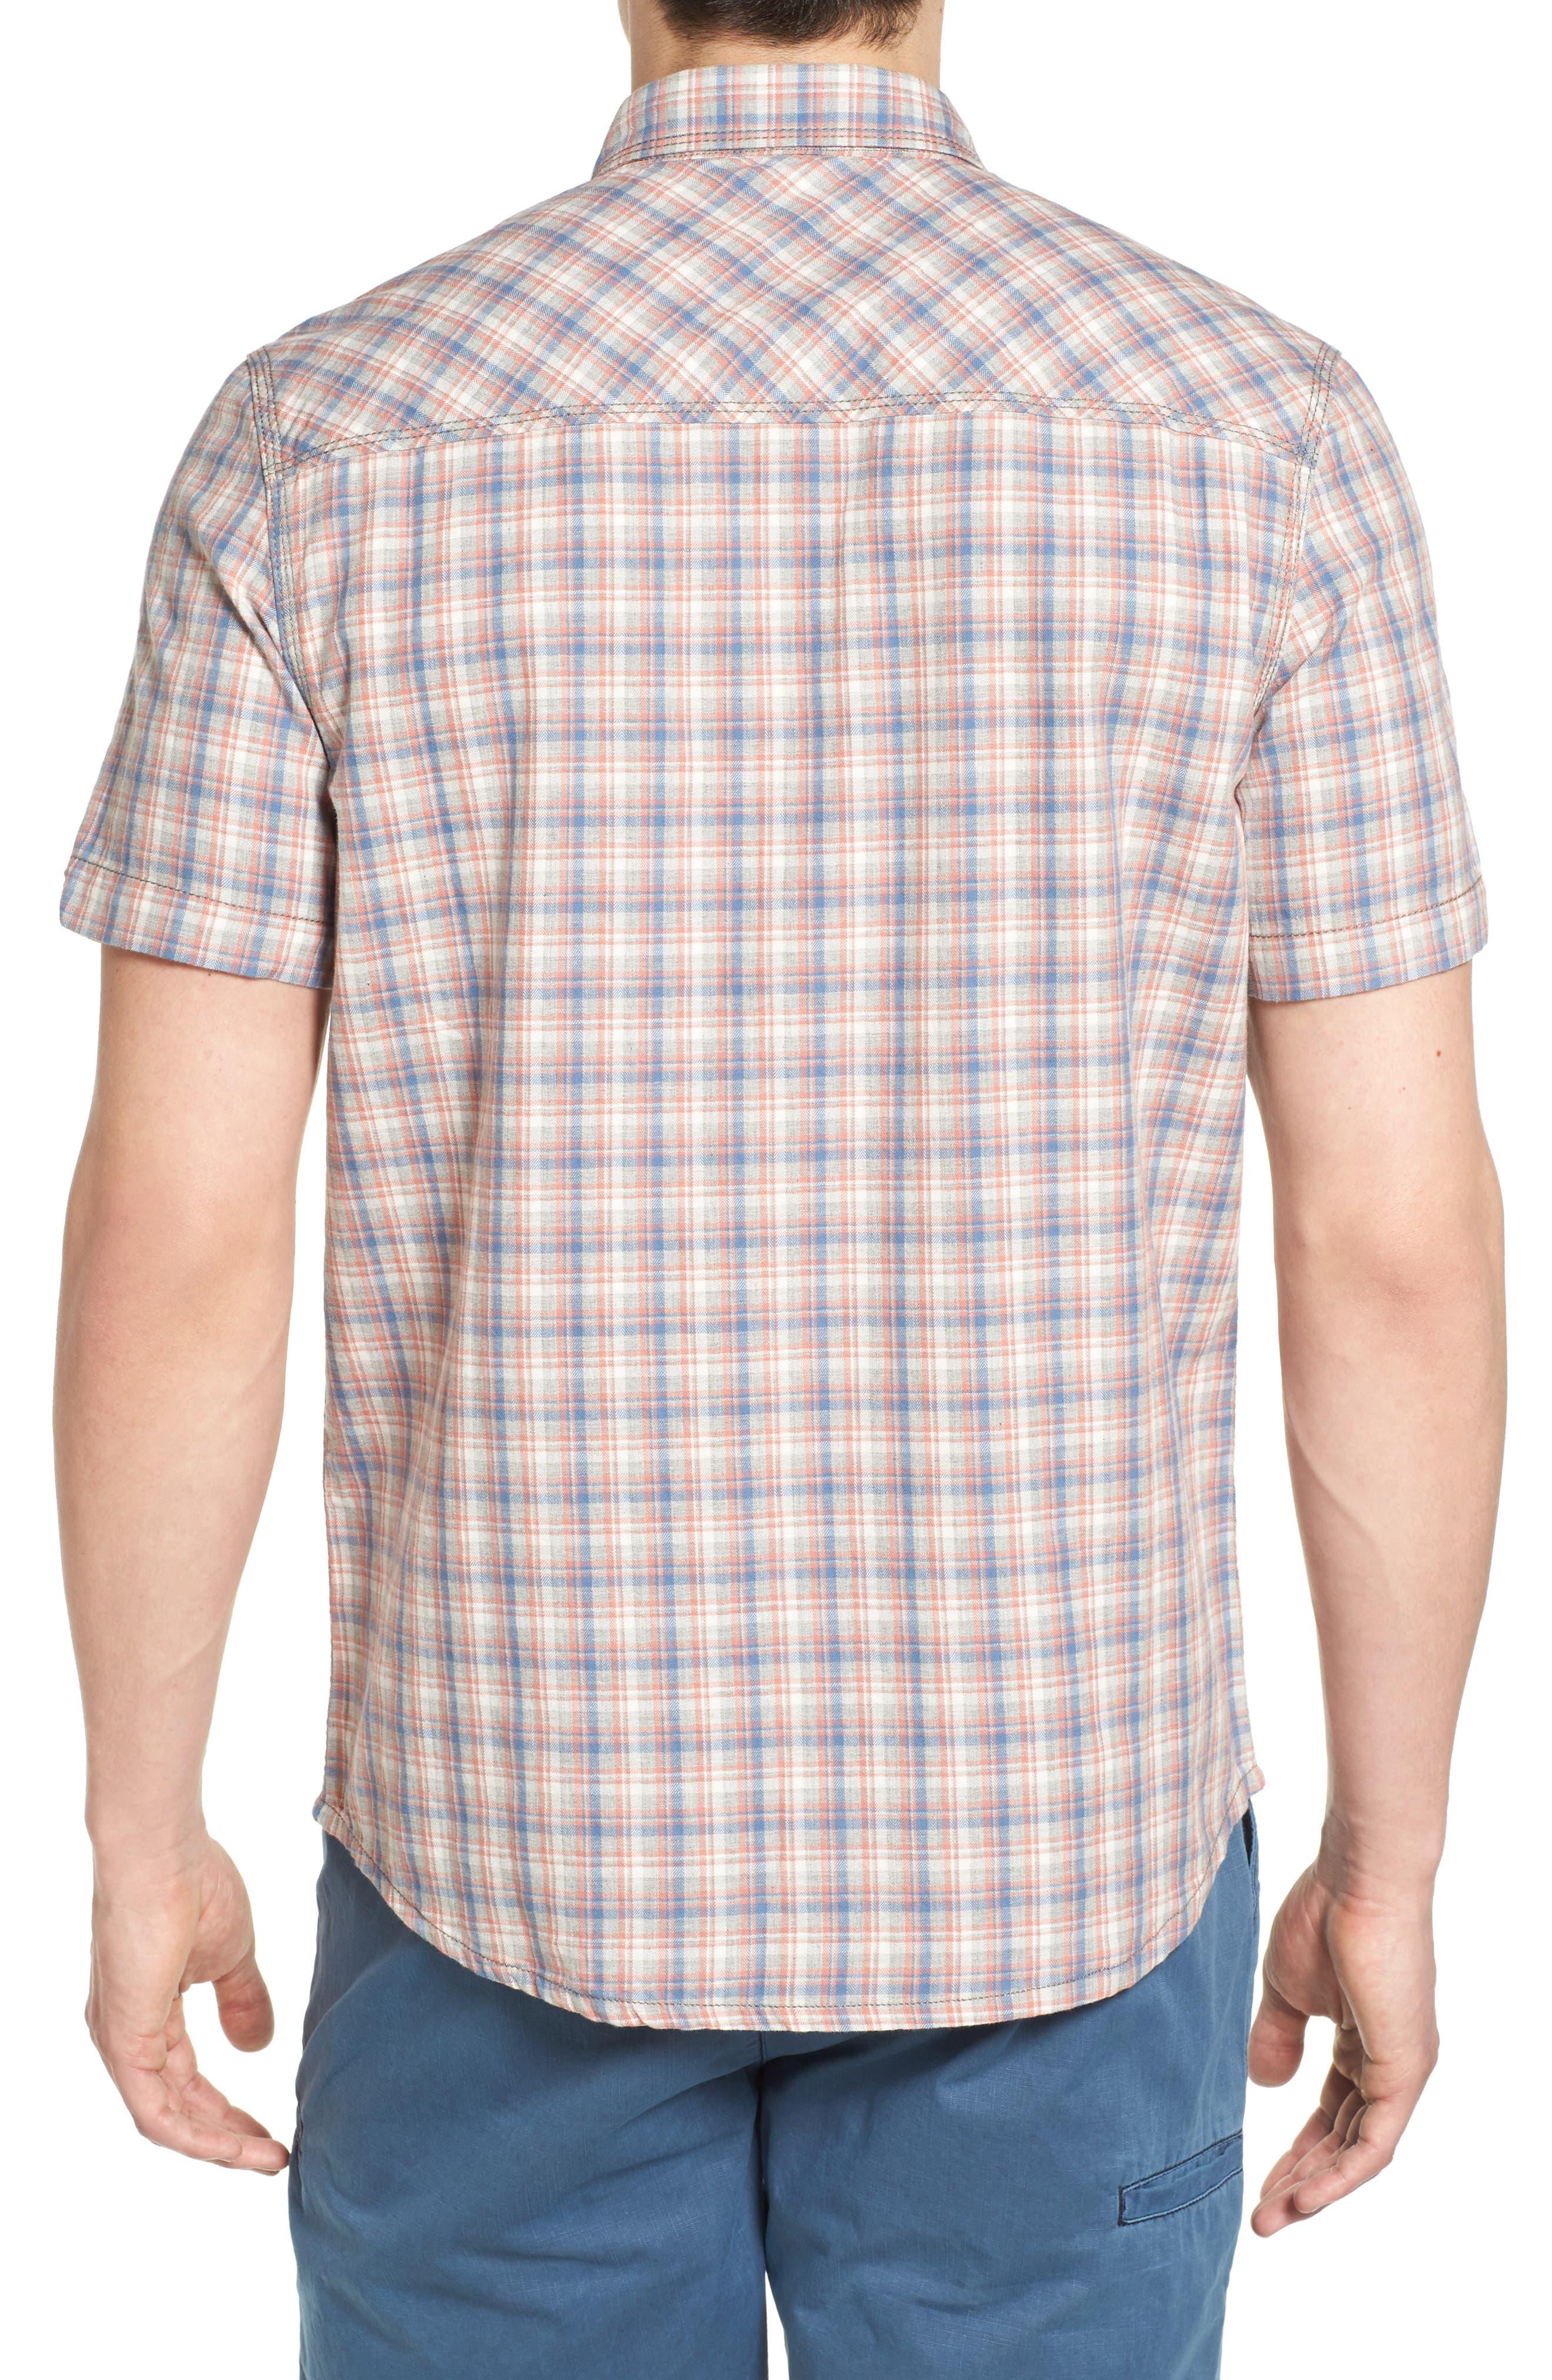 Solana Regular Fit Herringbone Plaid Sport Shirt,                             Alternate thumbnail 2, color,                             045